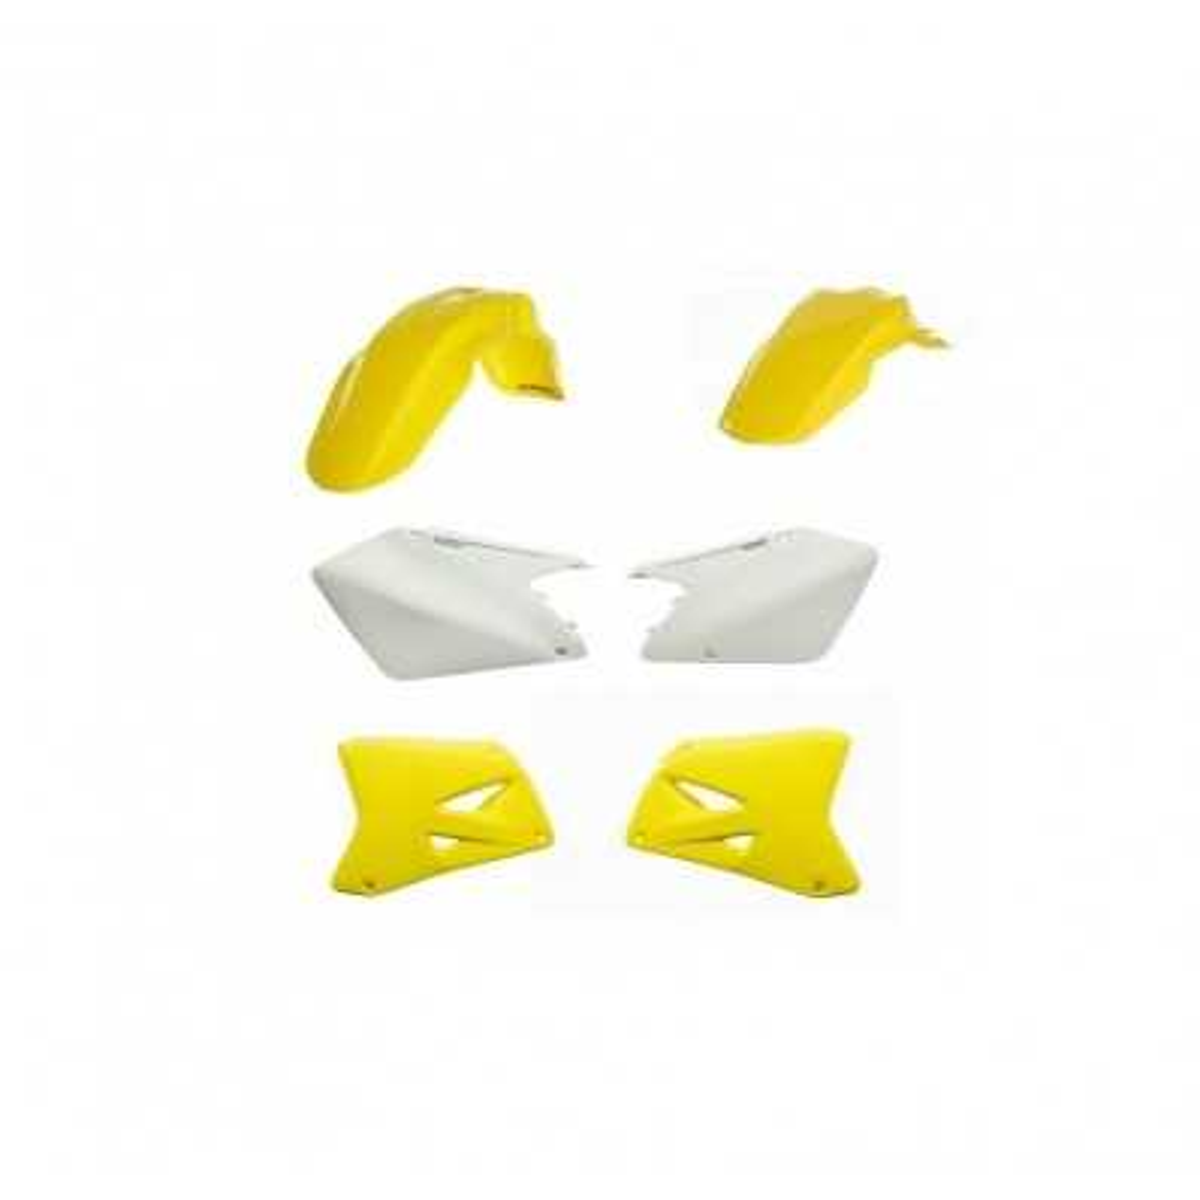 0013776-061 - Kit Plasticos Rmz 250 10 17 Amarillo Fluor